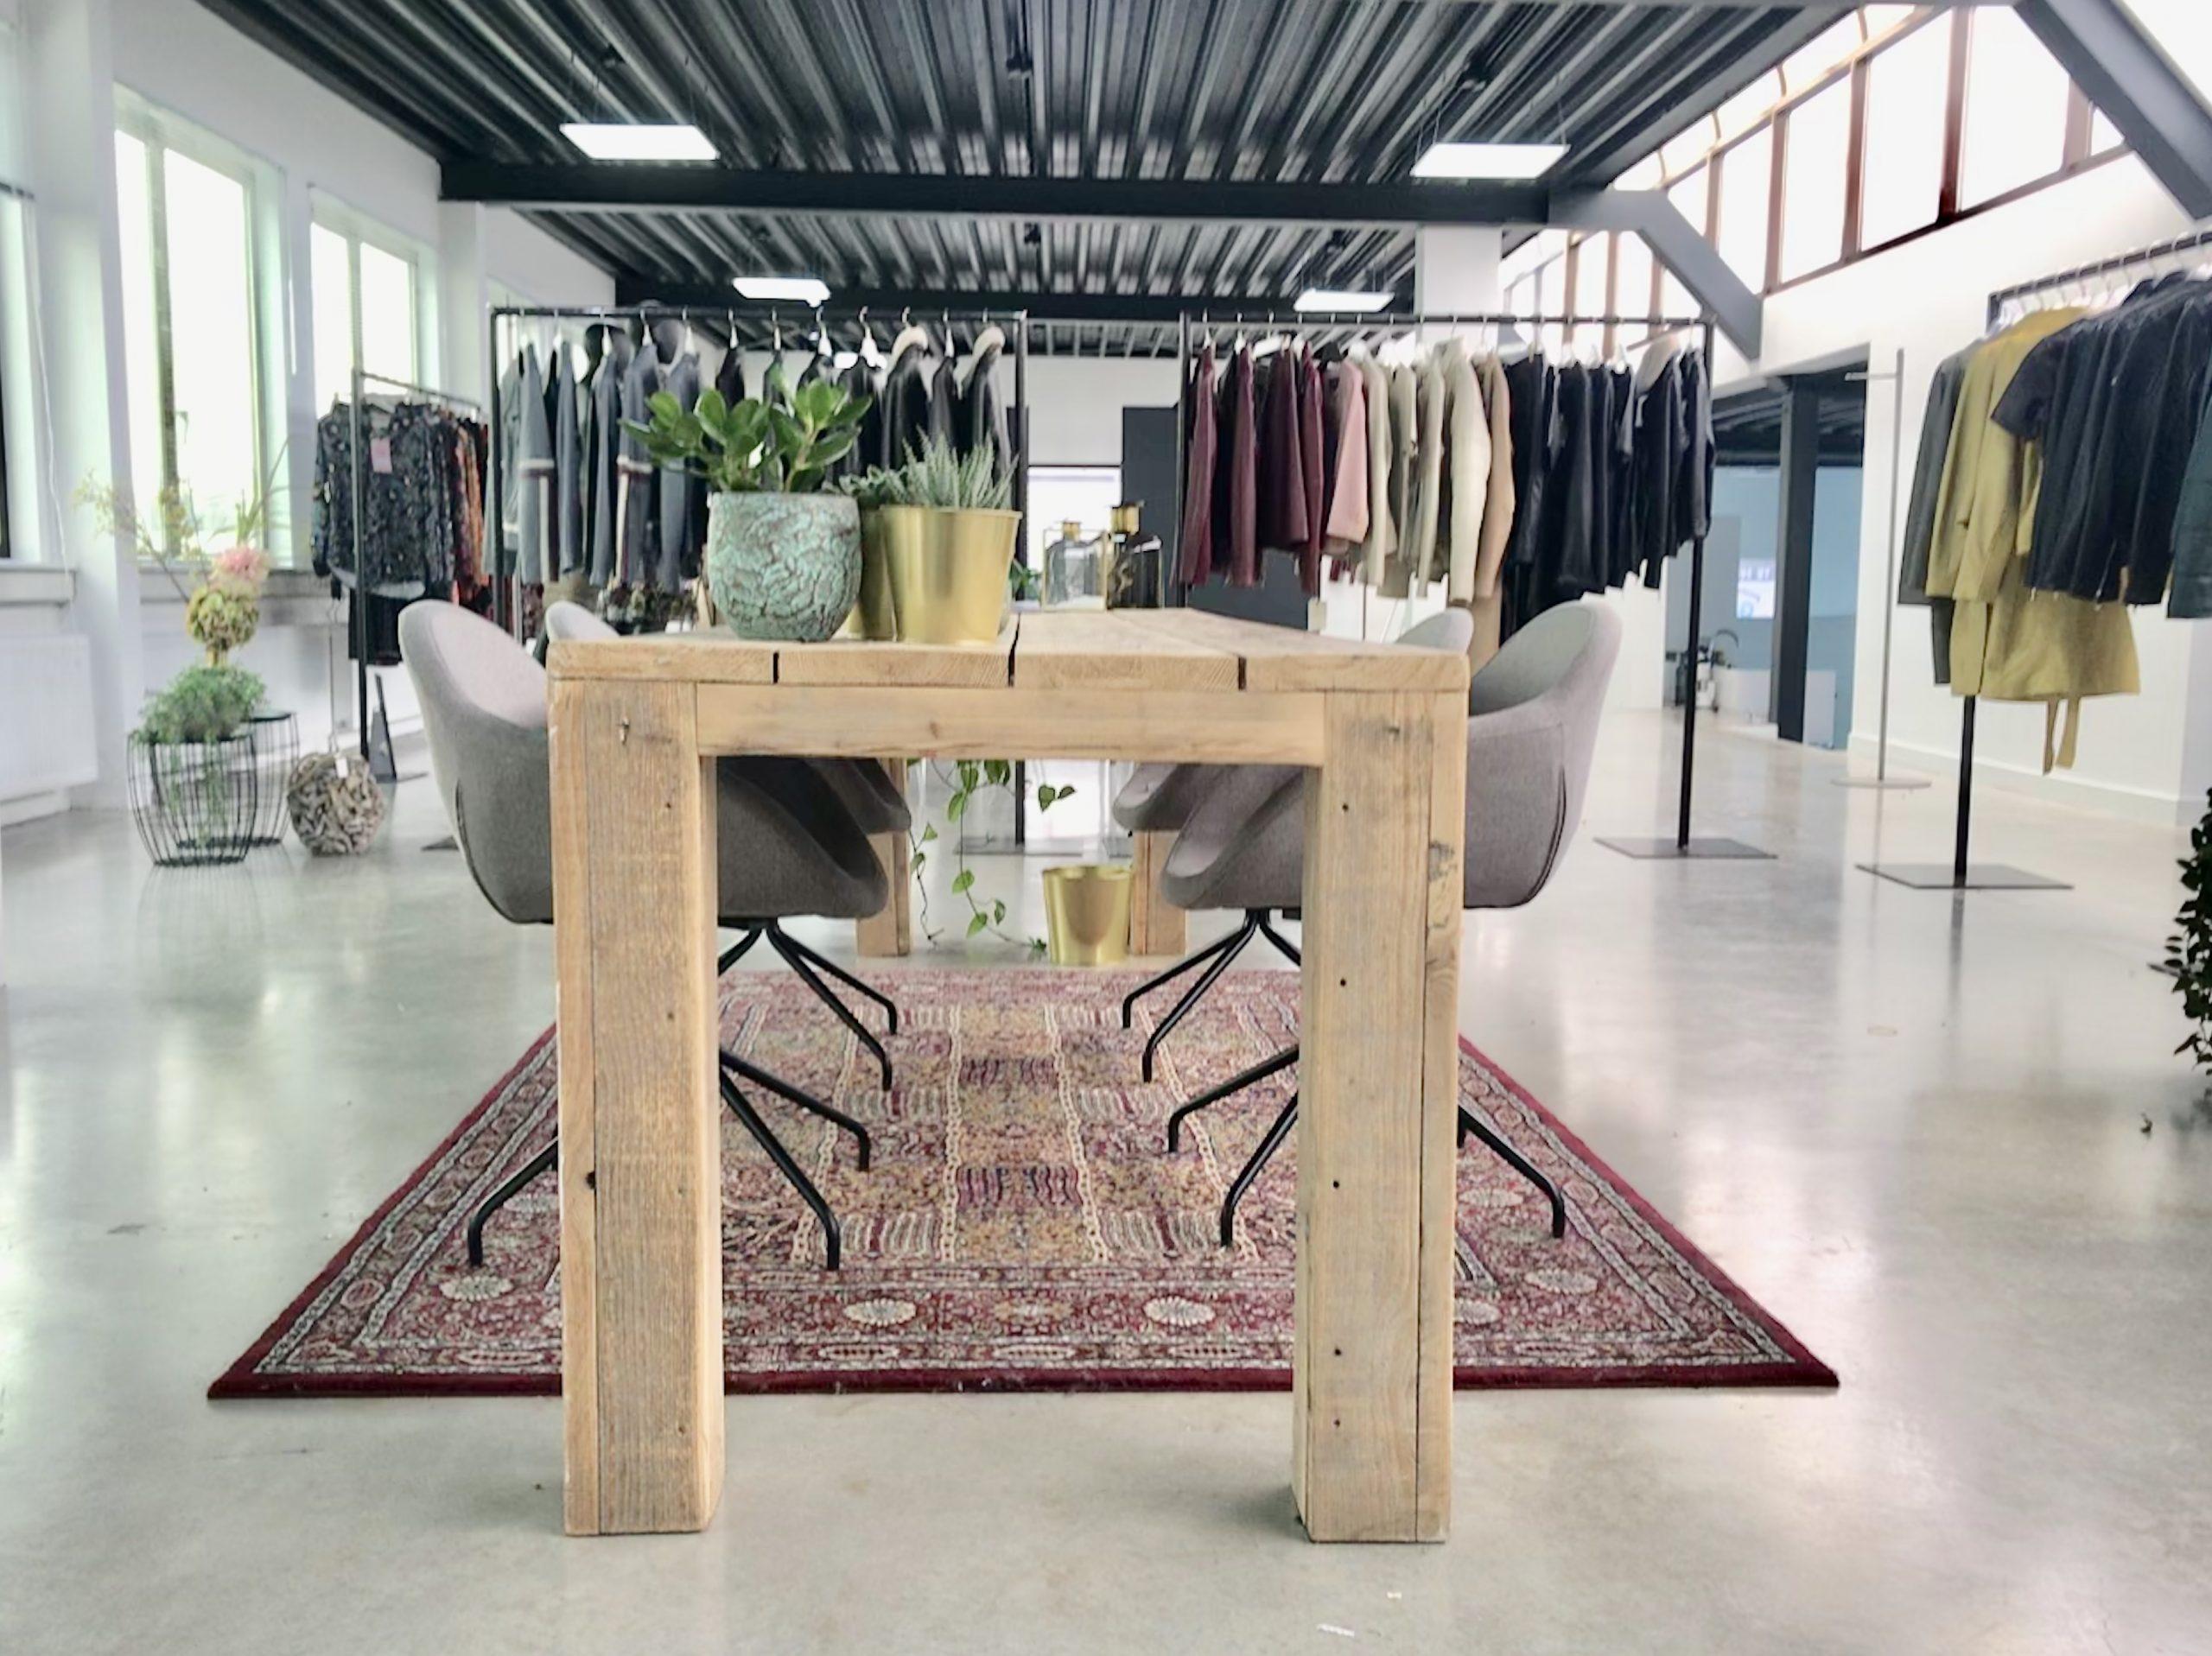 transmission-fashion.com-showroom-amsterdam-leer-leather-jacket-fashion-styling